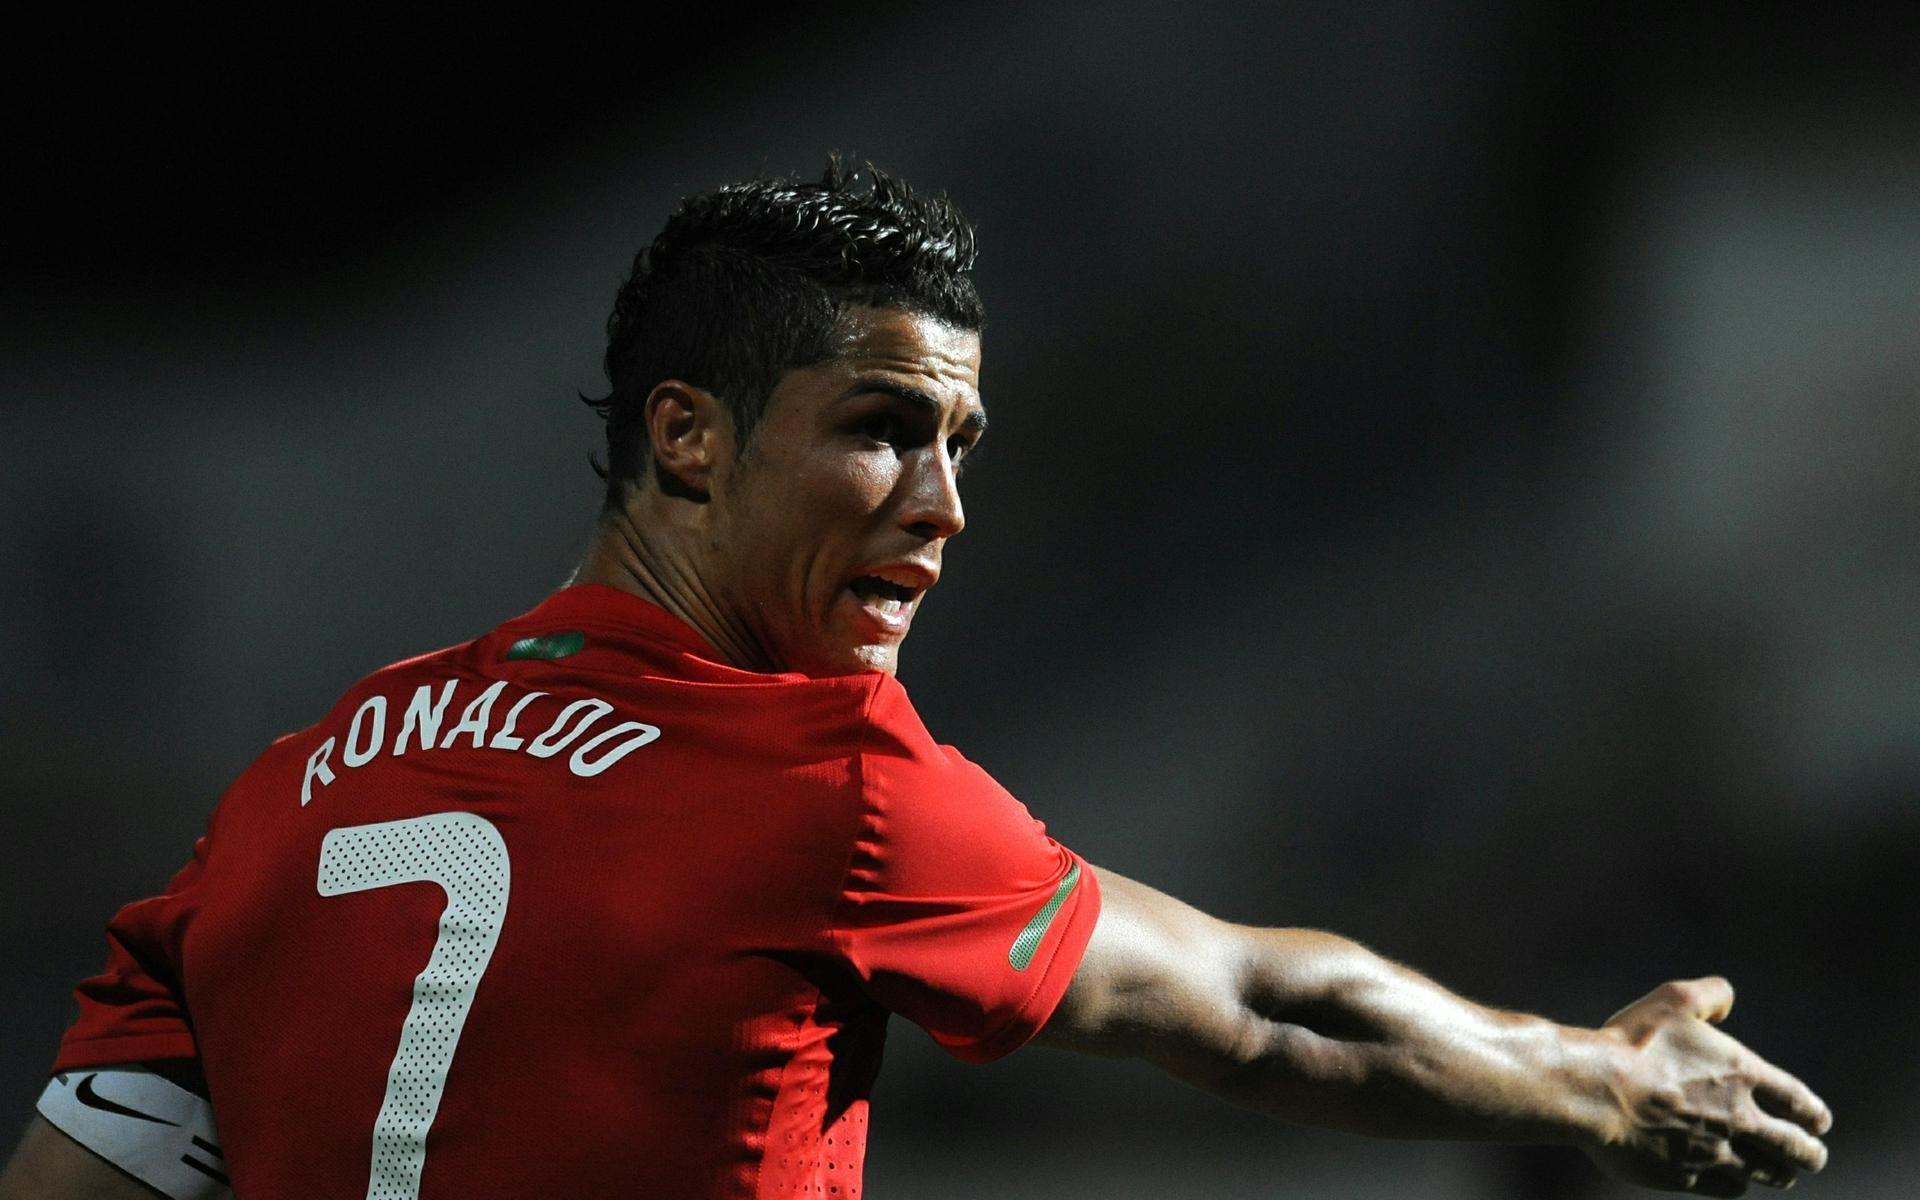 cristiano-ronaldo-hd-images-9 | Cristiano Ronaldo HD Images | Pinterest |  Hd images, Cristiano ronaldo and Ronaldo